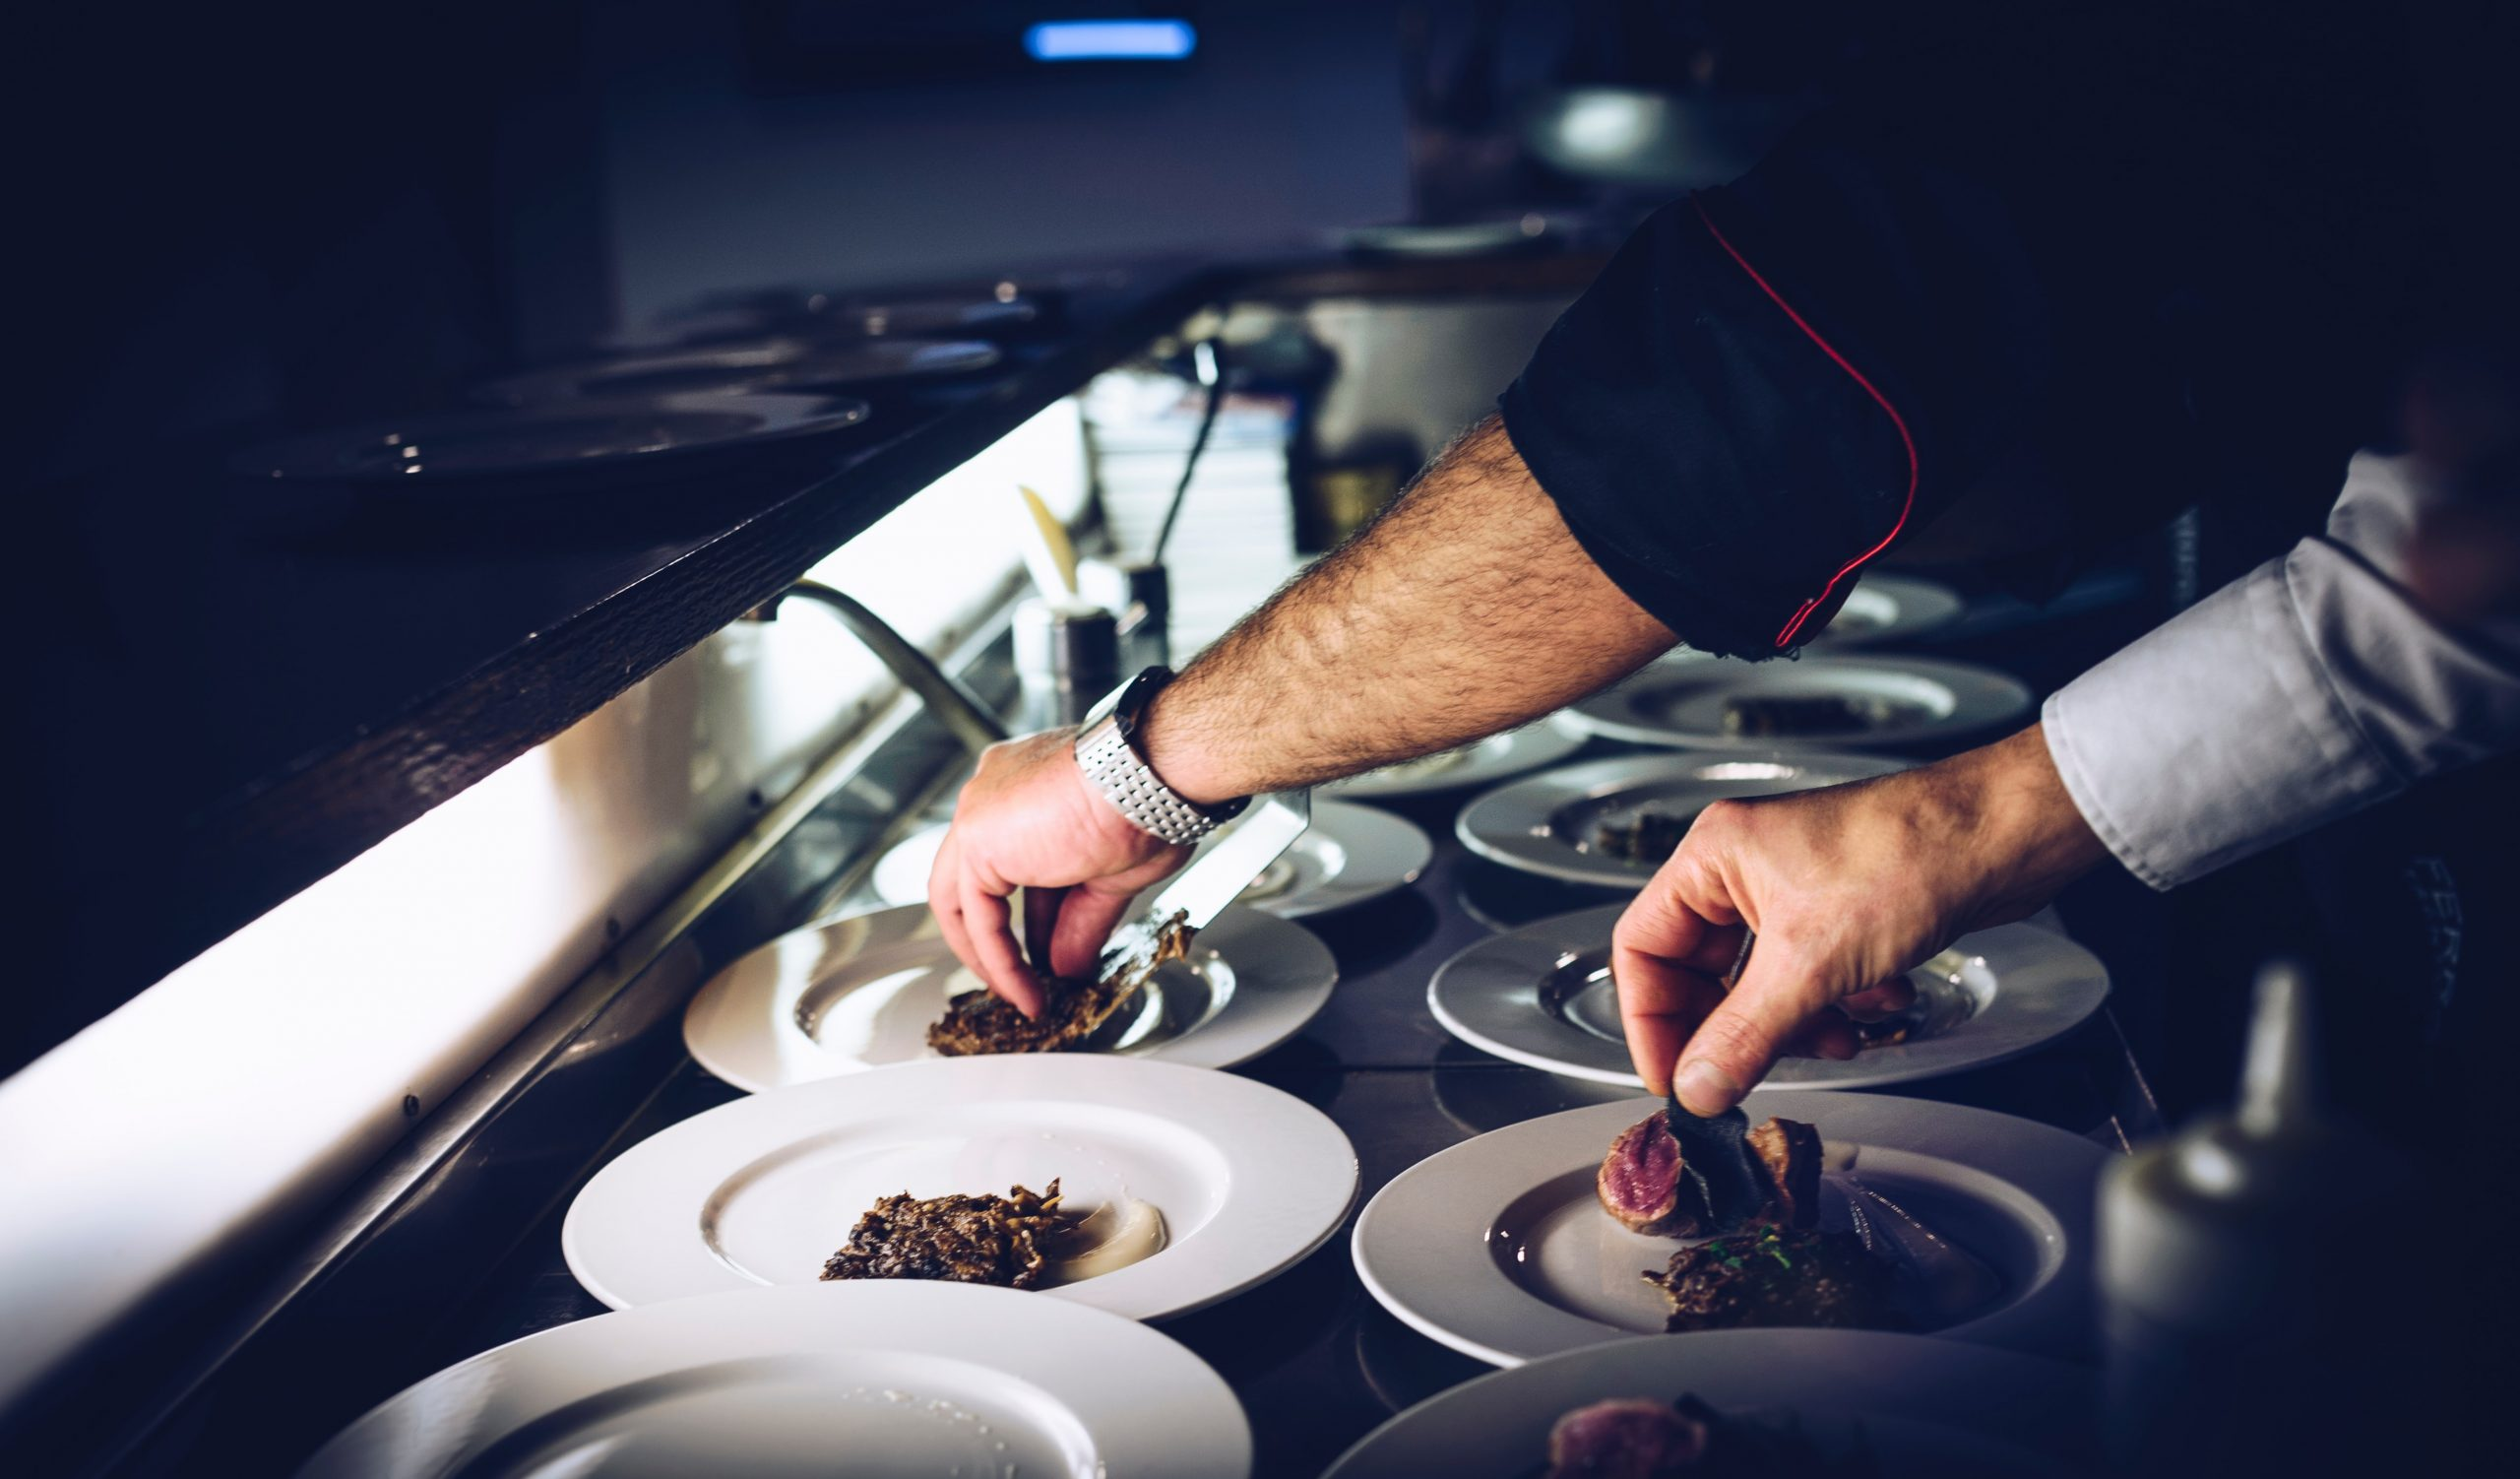 Restaurant food prep. Photo by Fabrizio Magoni on Unsplash